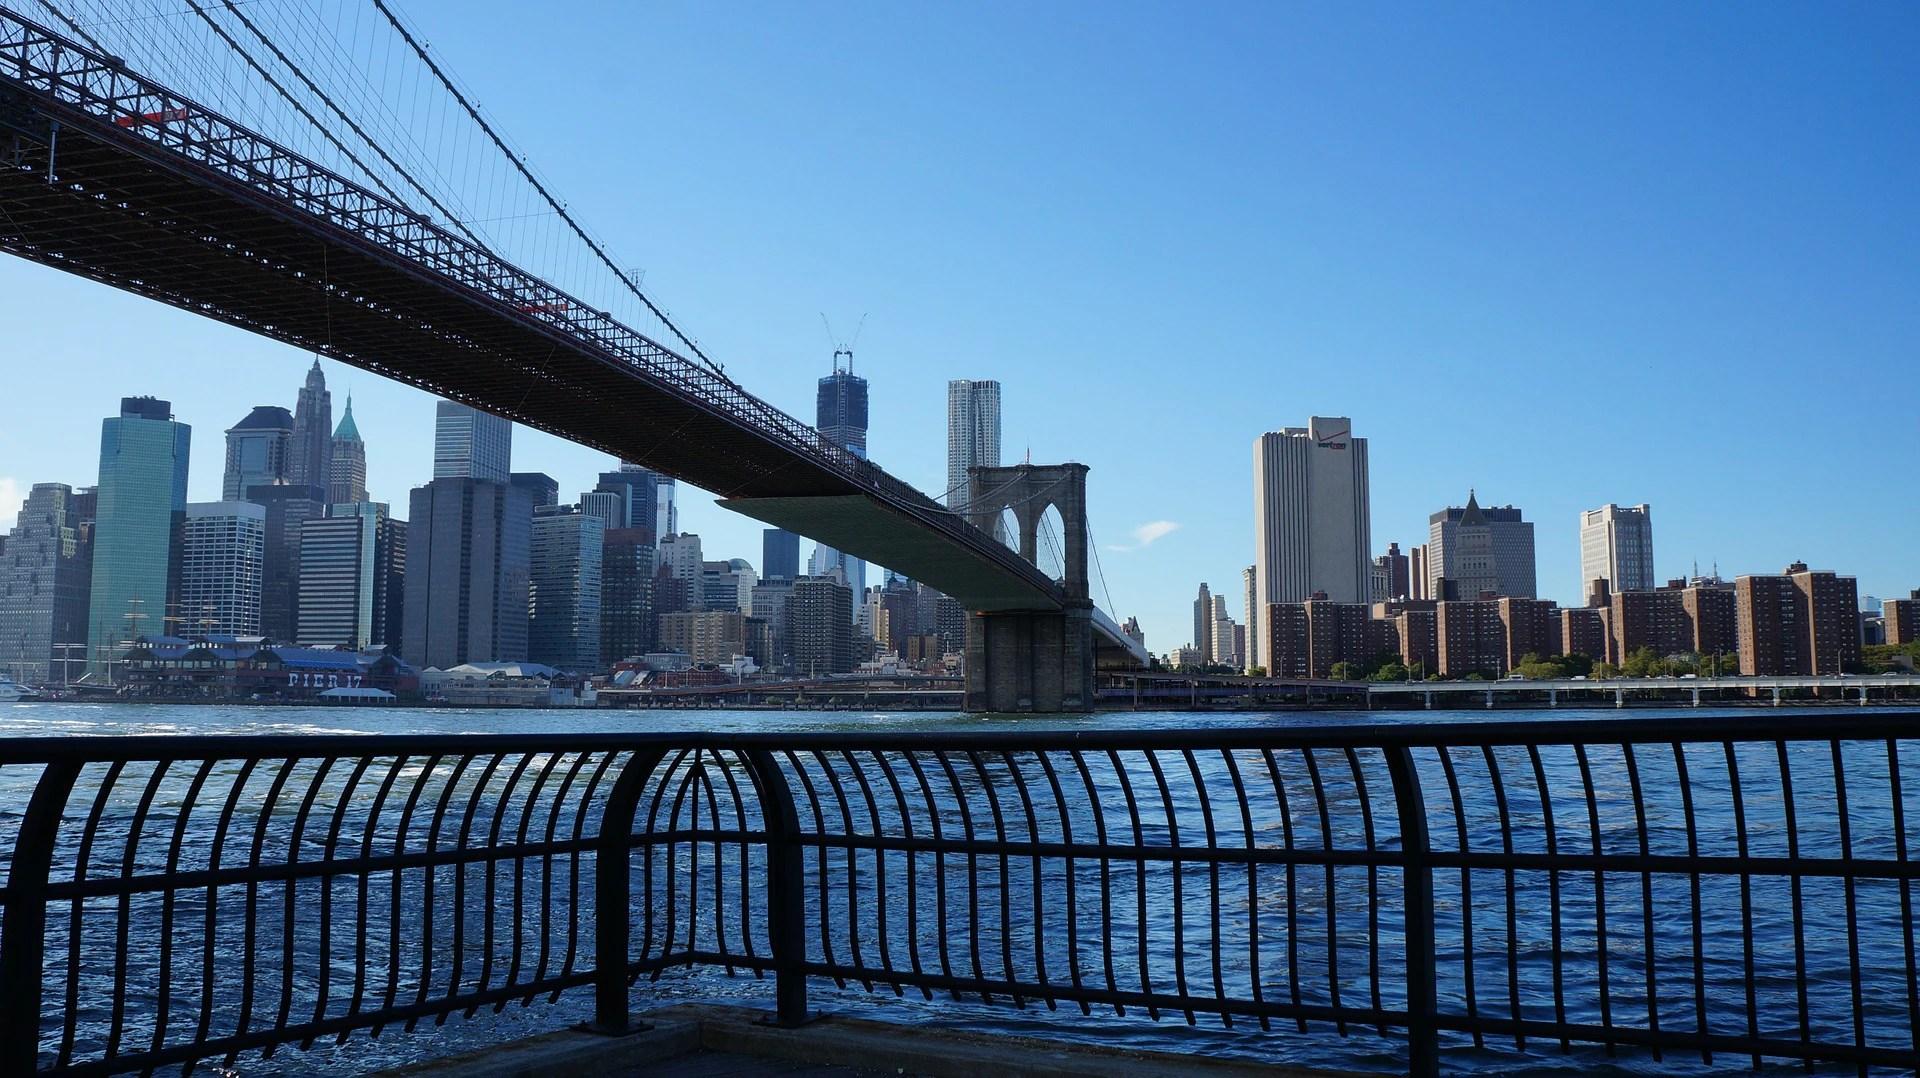 Descriptive Writing Of New York City At Night 77 Things